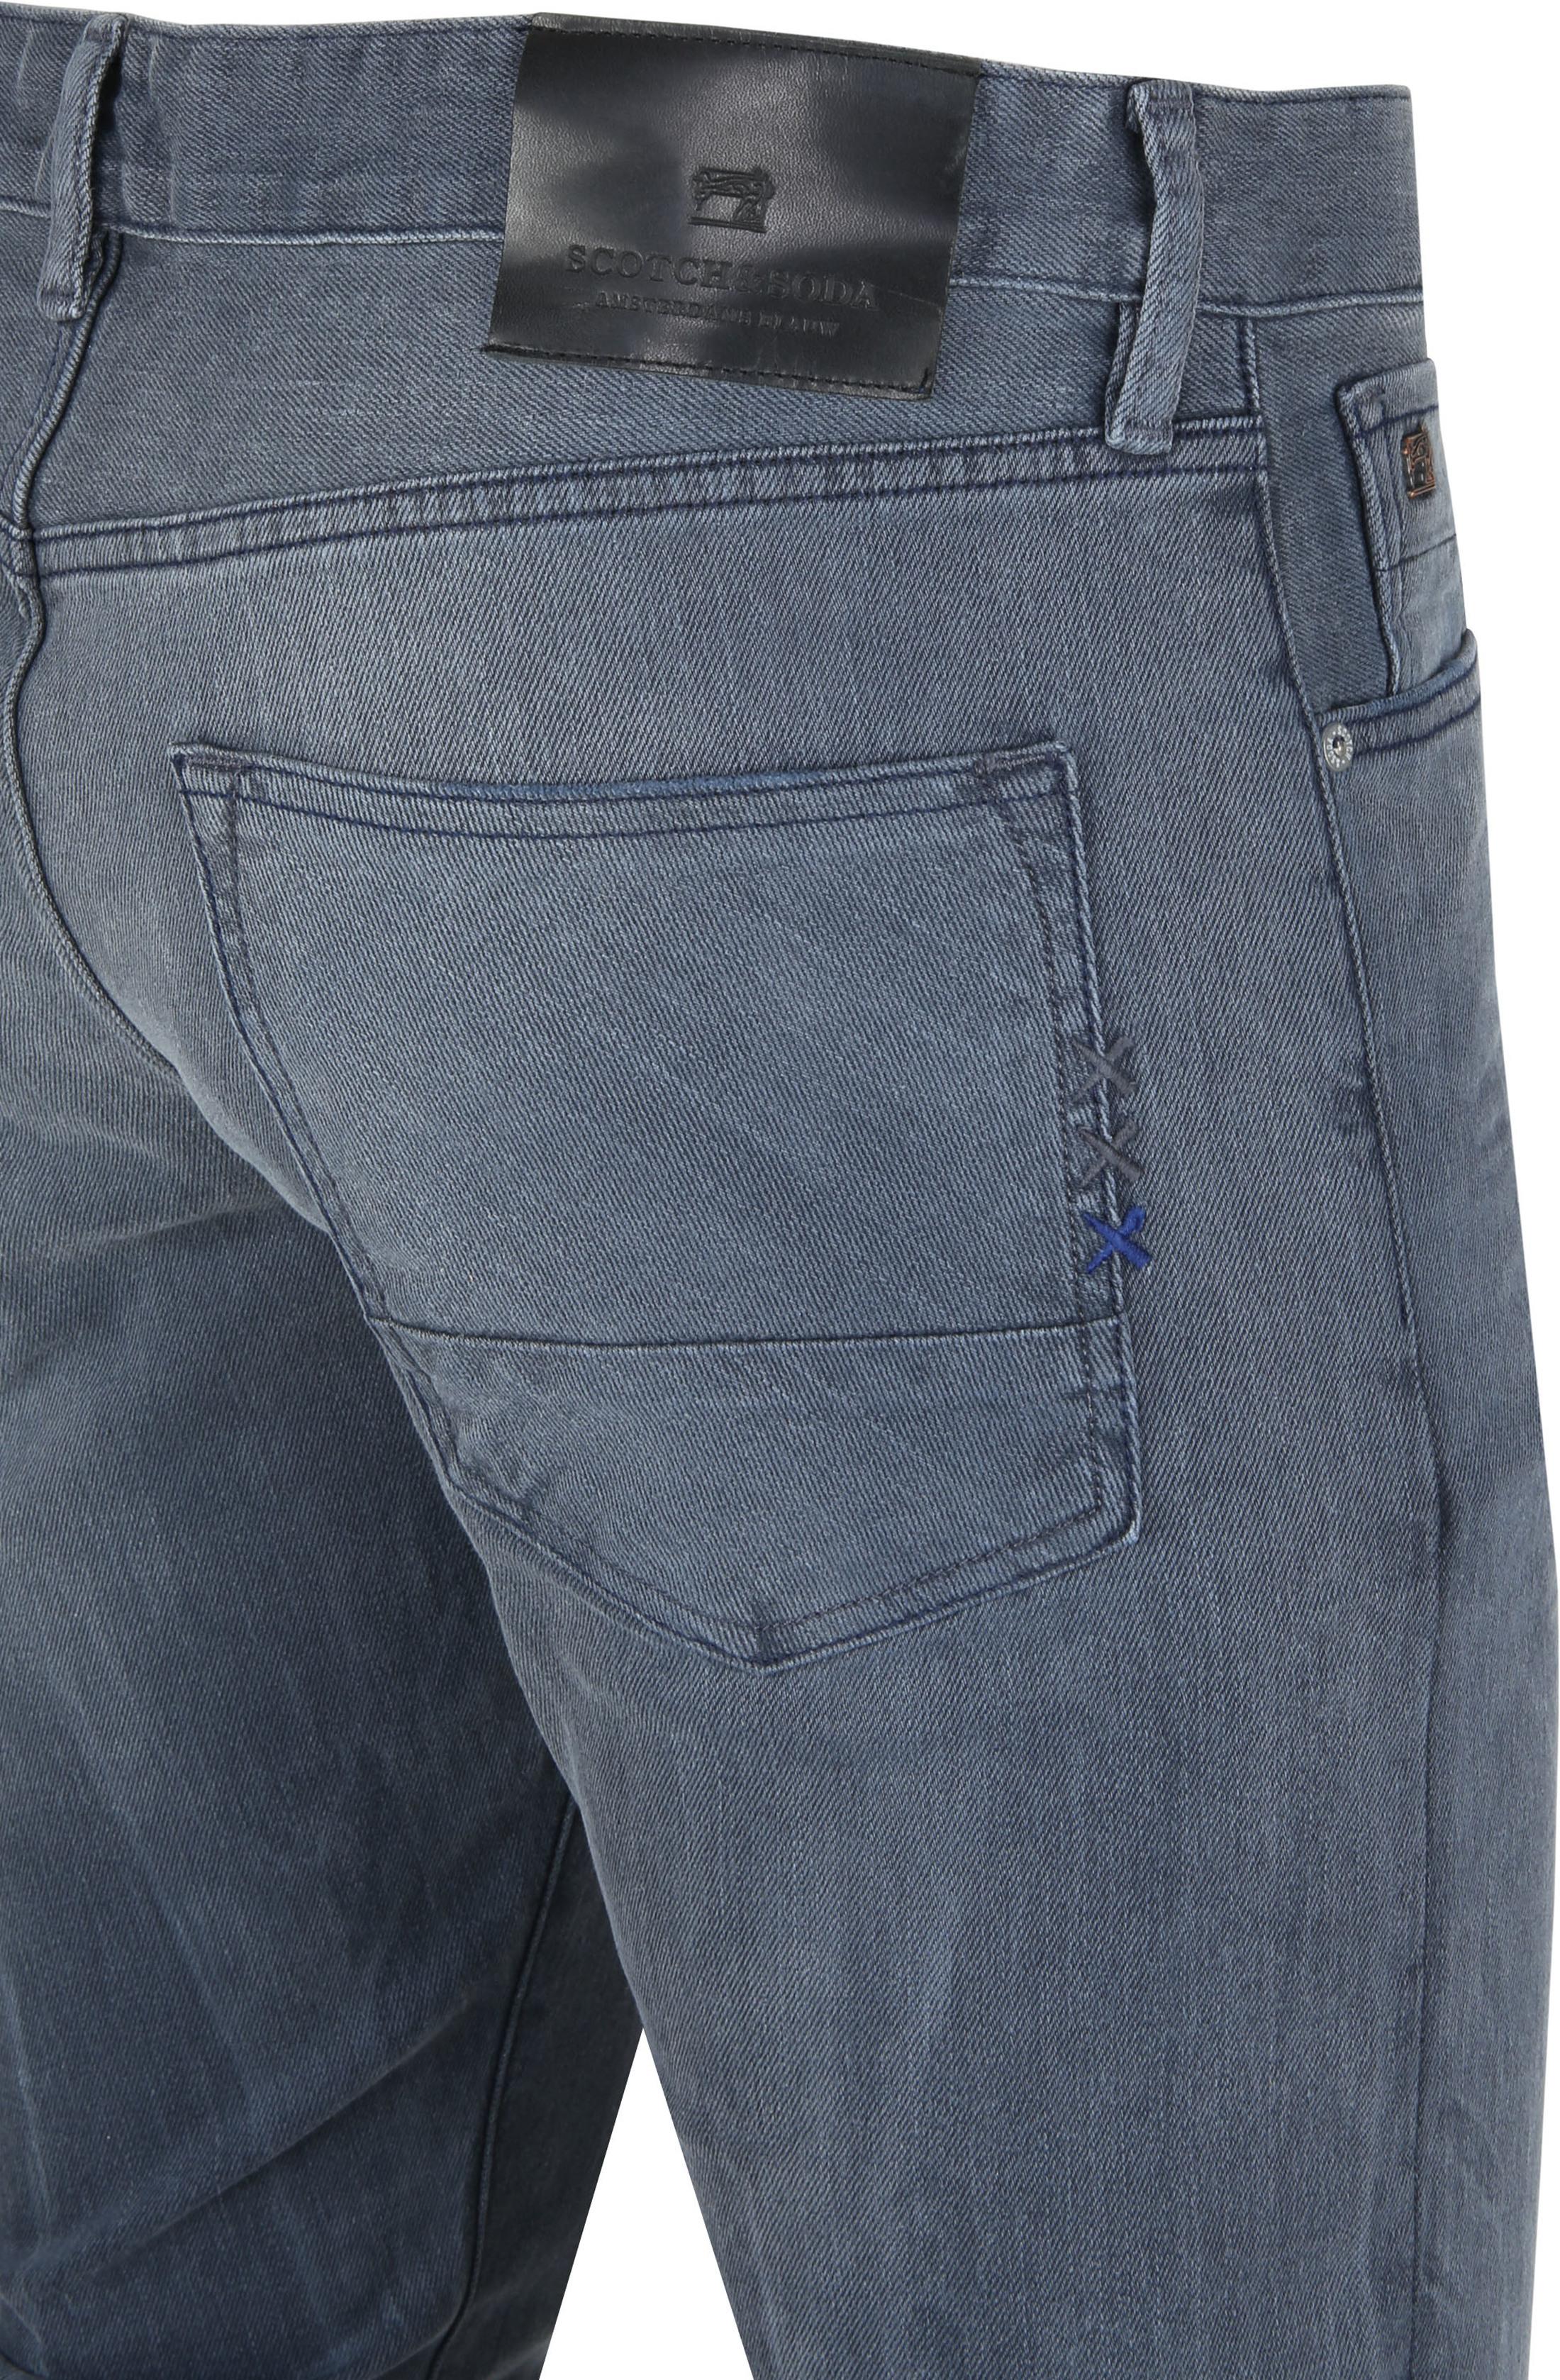 Scotch and Soda Ralston Jeans Concrete Bleach